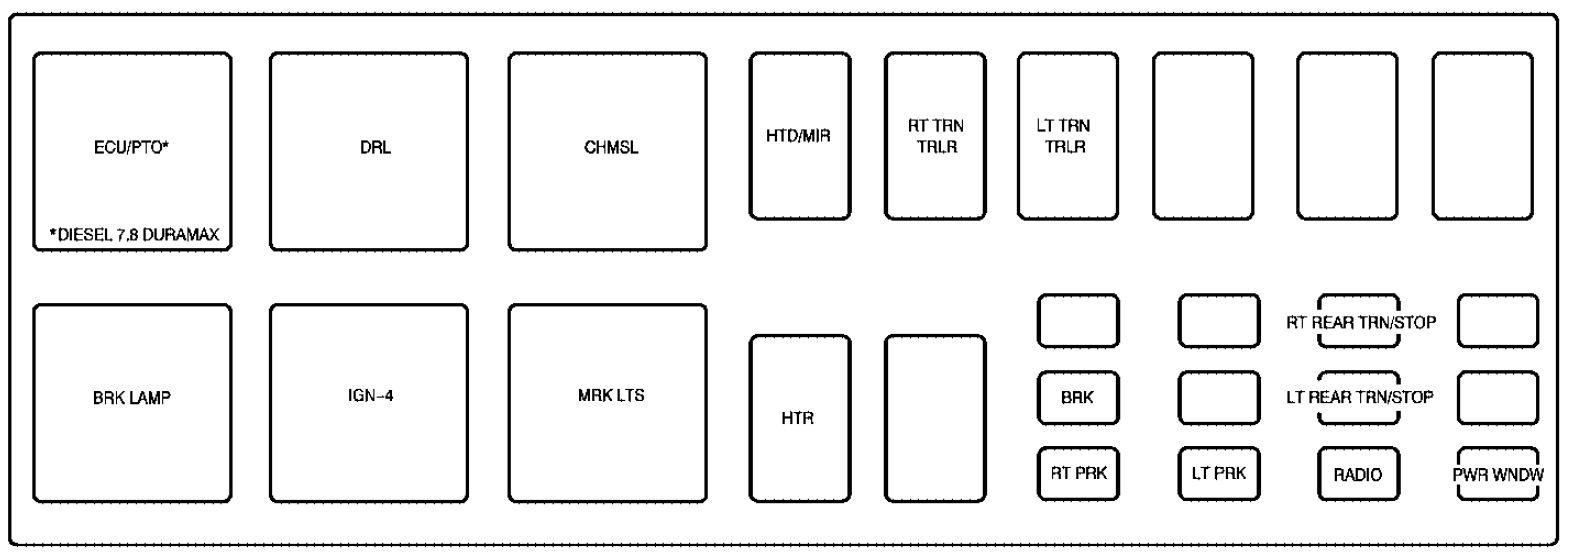 gm c6500 fuse box wiring diagram online rh 7 9 lightandzaun de 1987  corvette fuse box